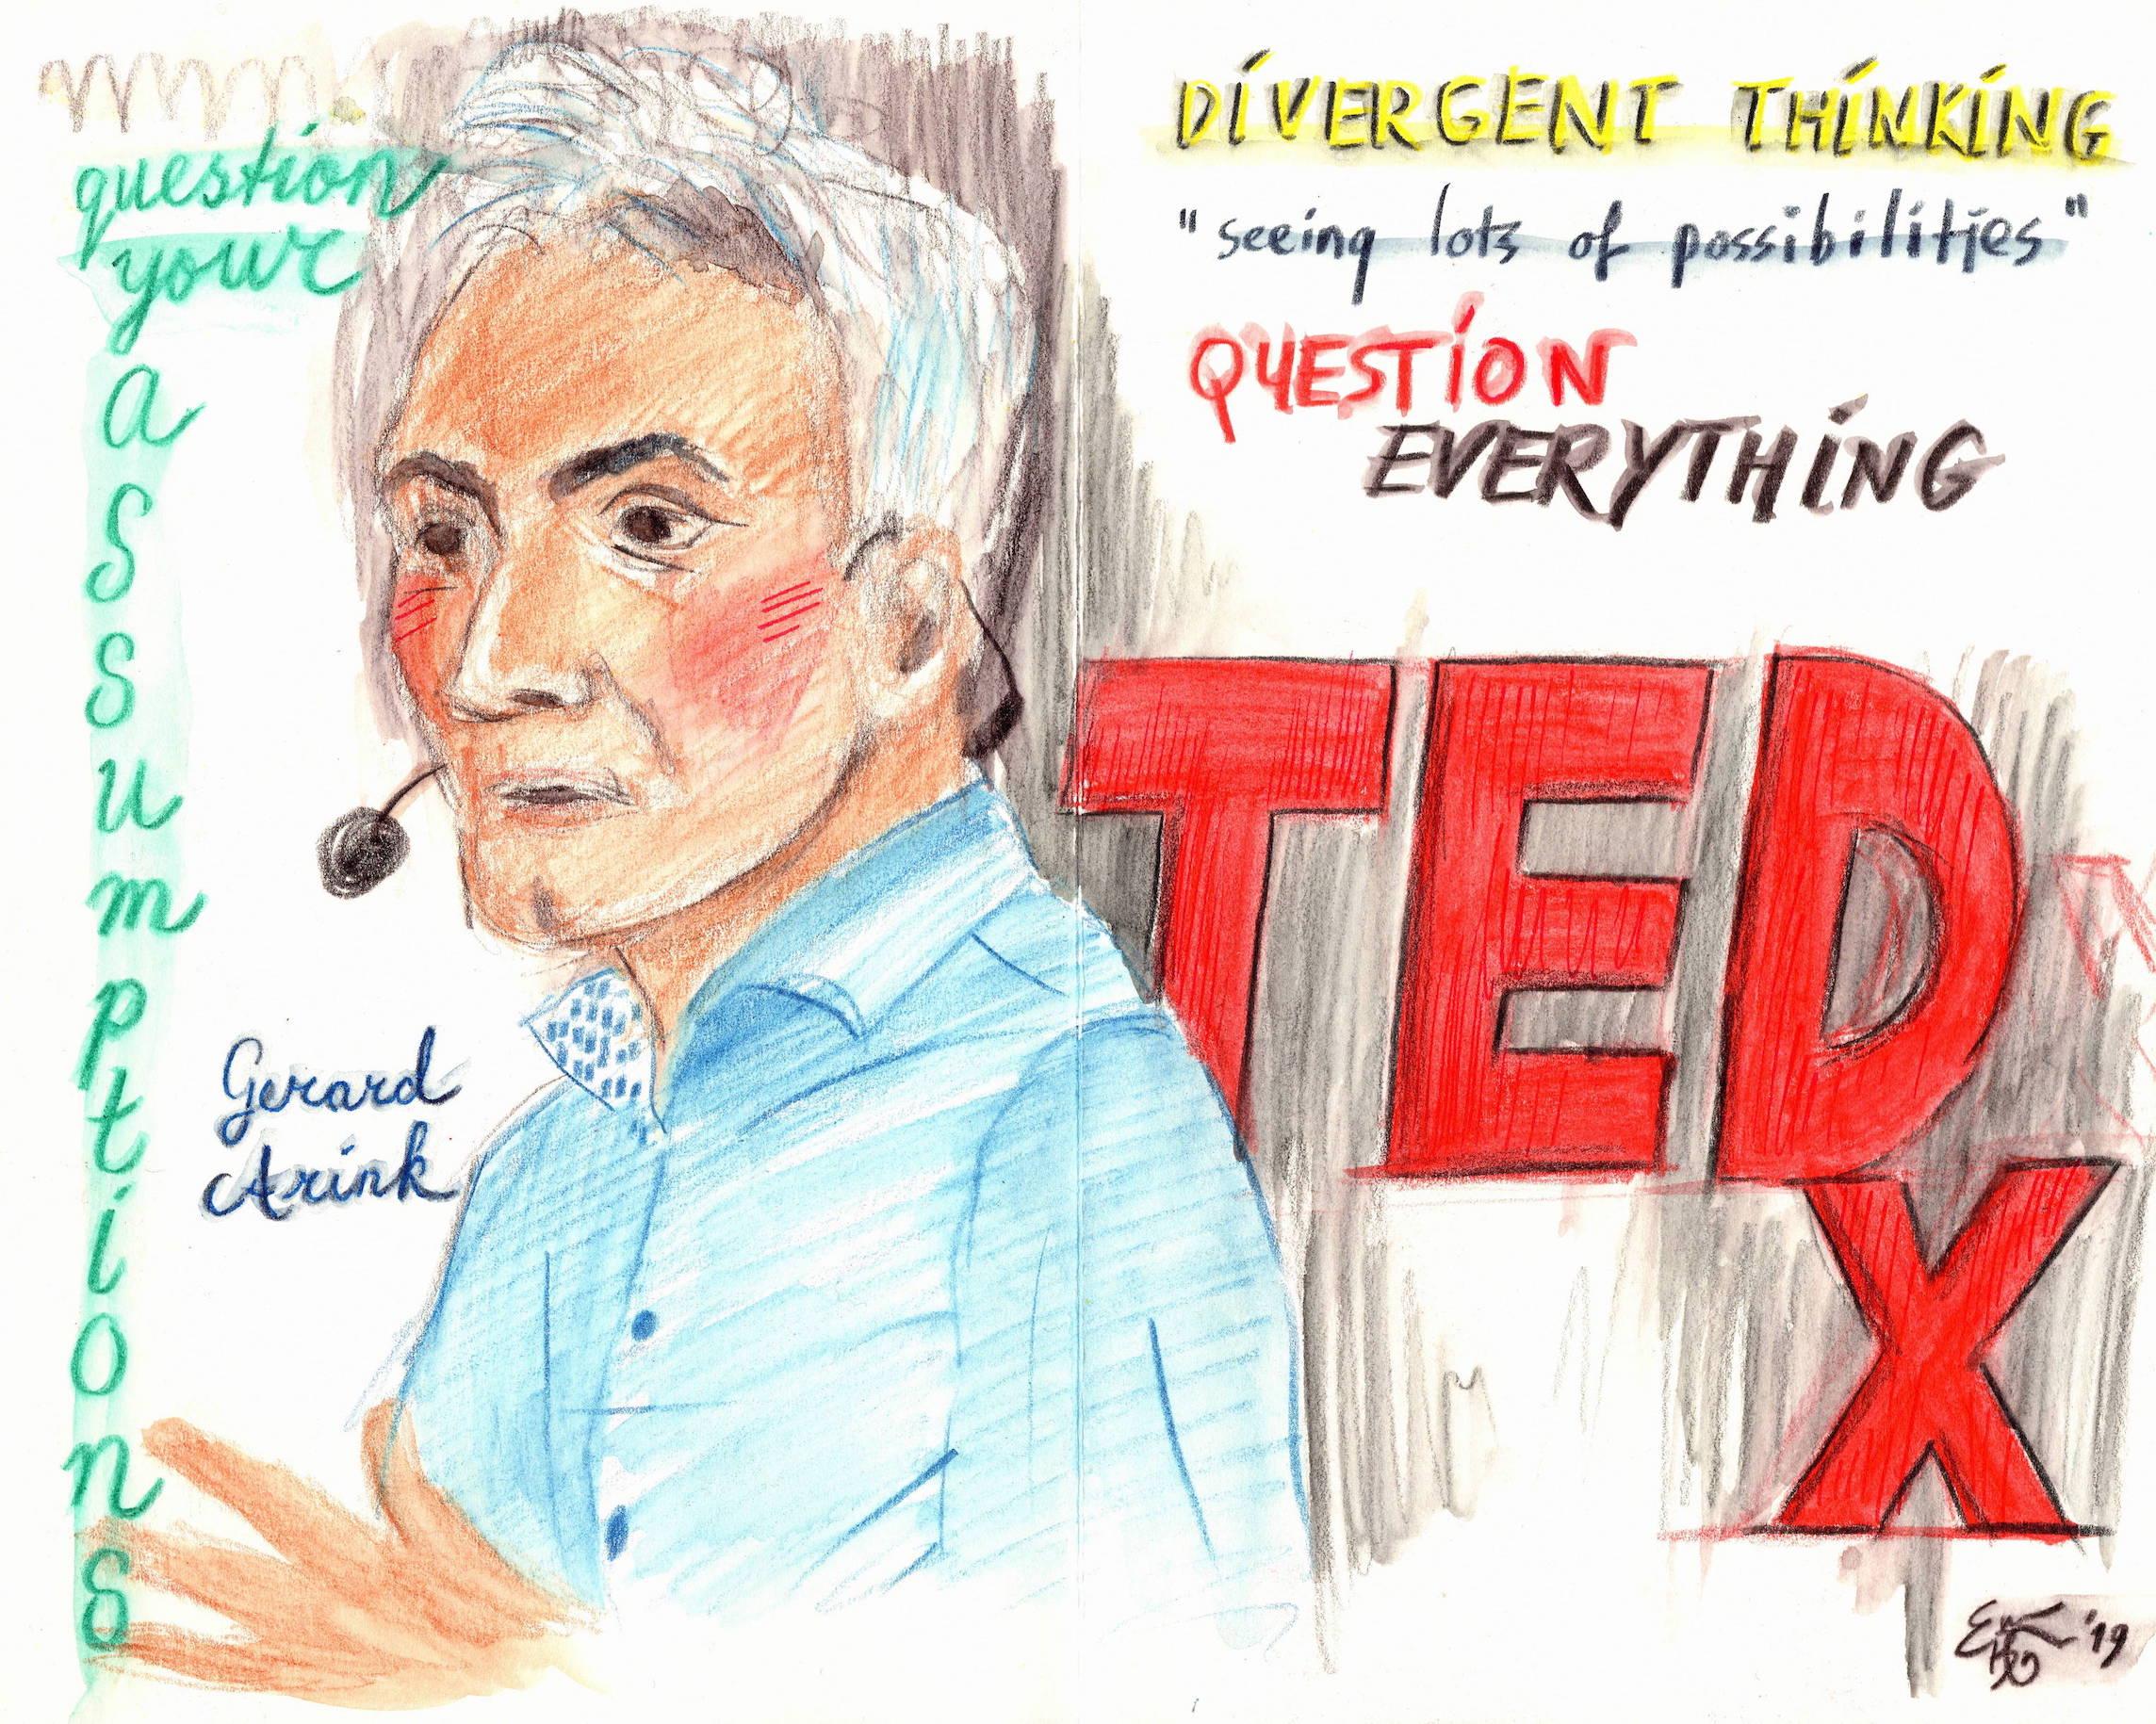 Gerard Arink, TEDxTilburg (c) Emma Bijloos 2019